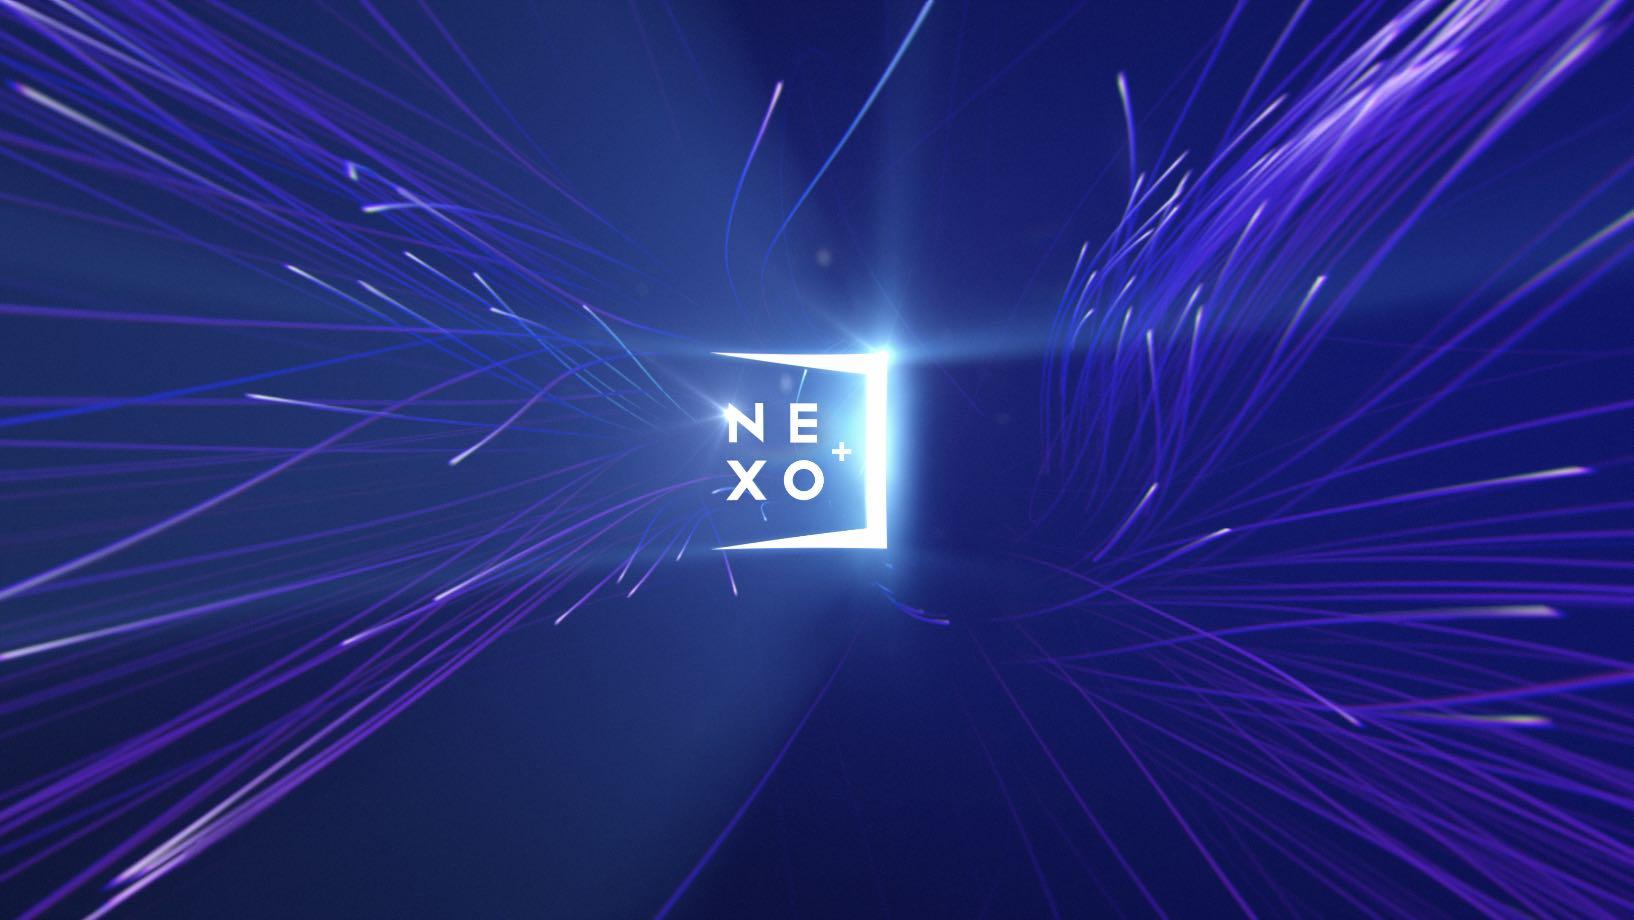 Nexo+ | Audio logo